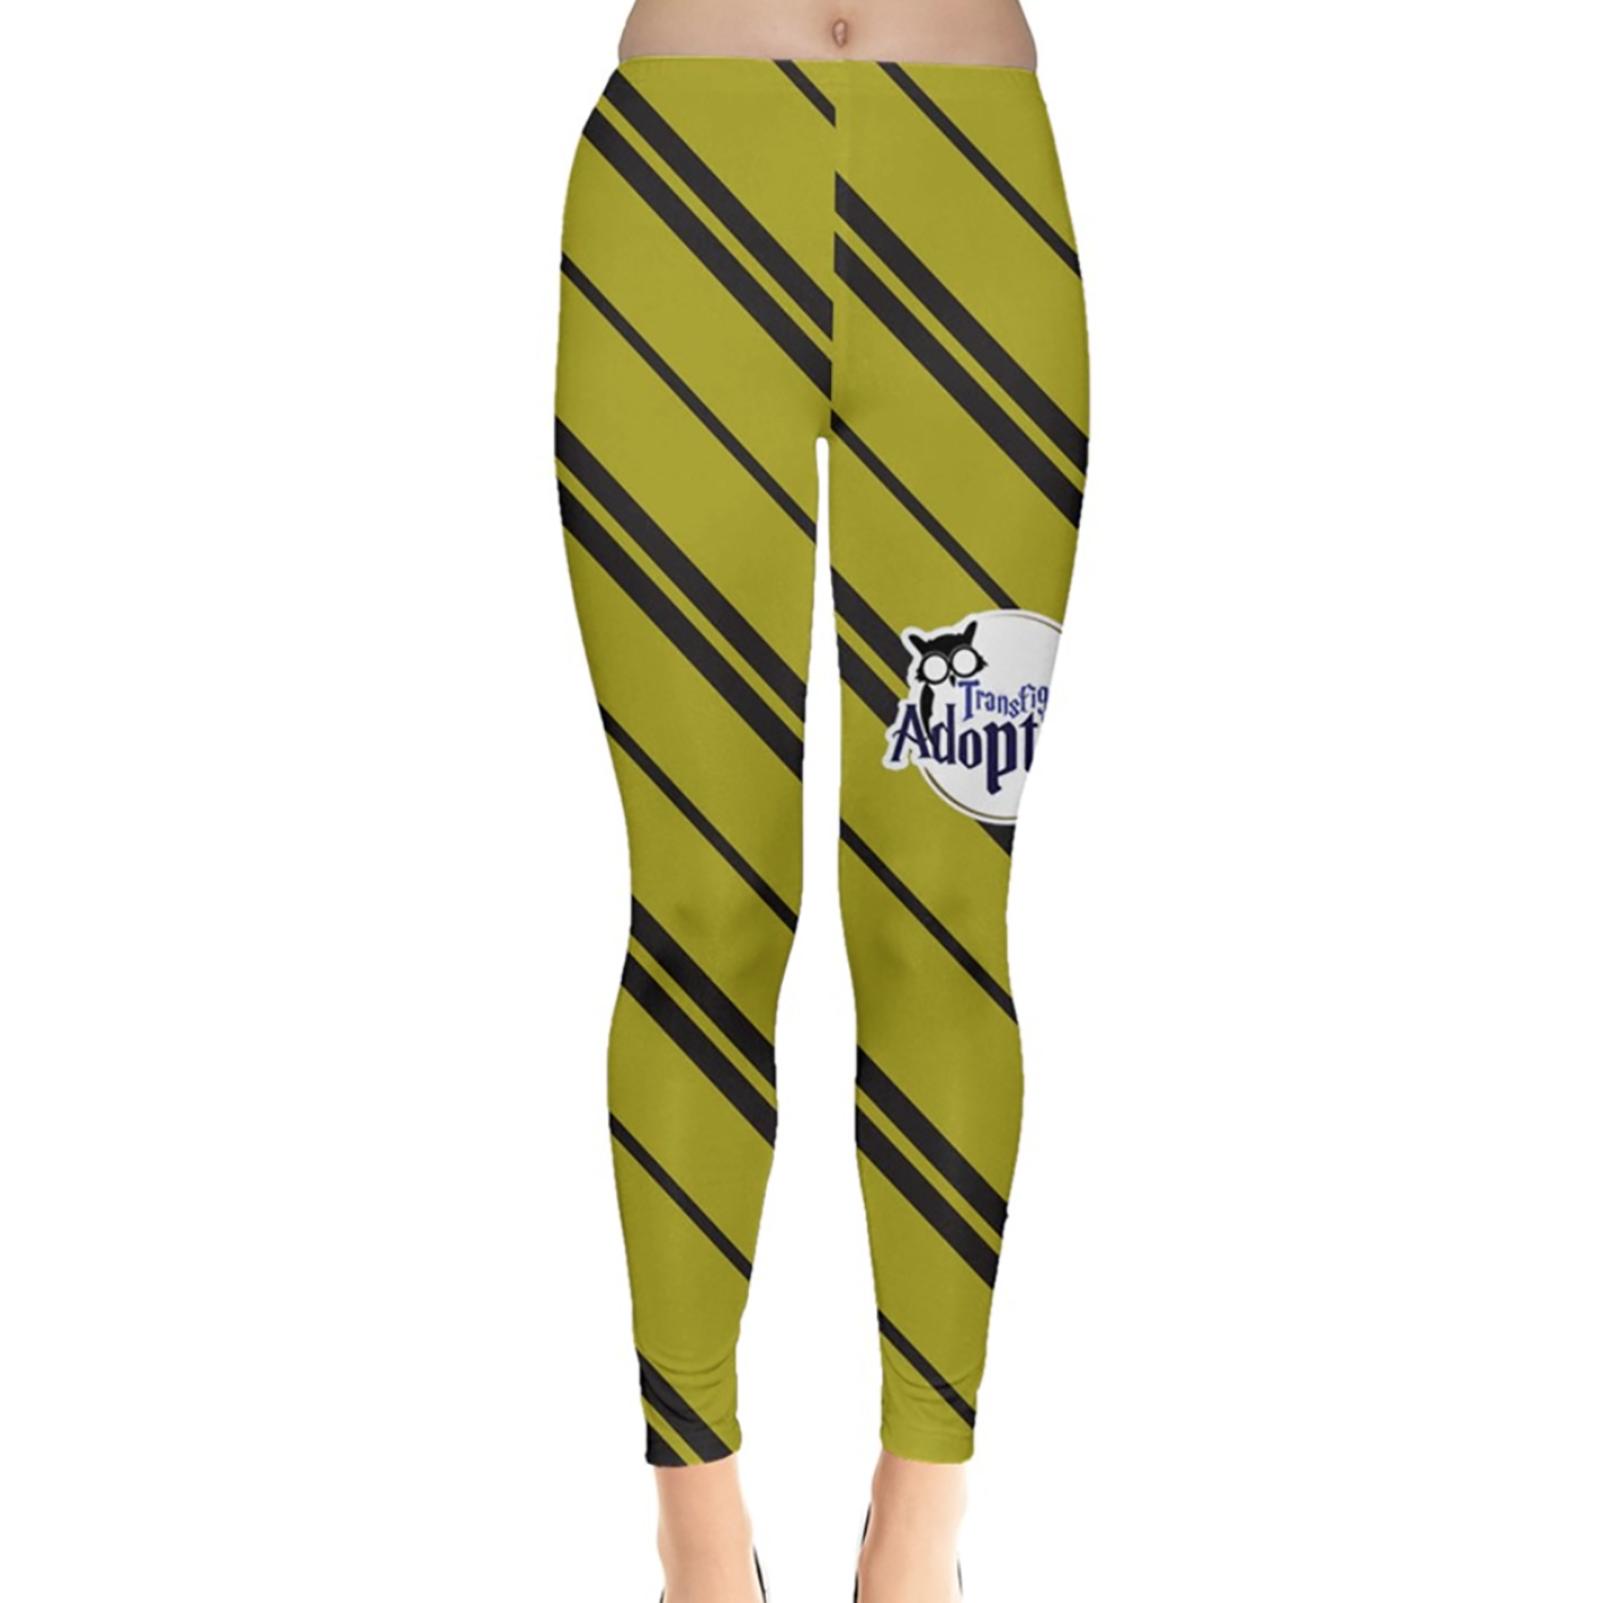 Yellow & Black Striped Leggings - Inspired by Hufflepuff